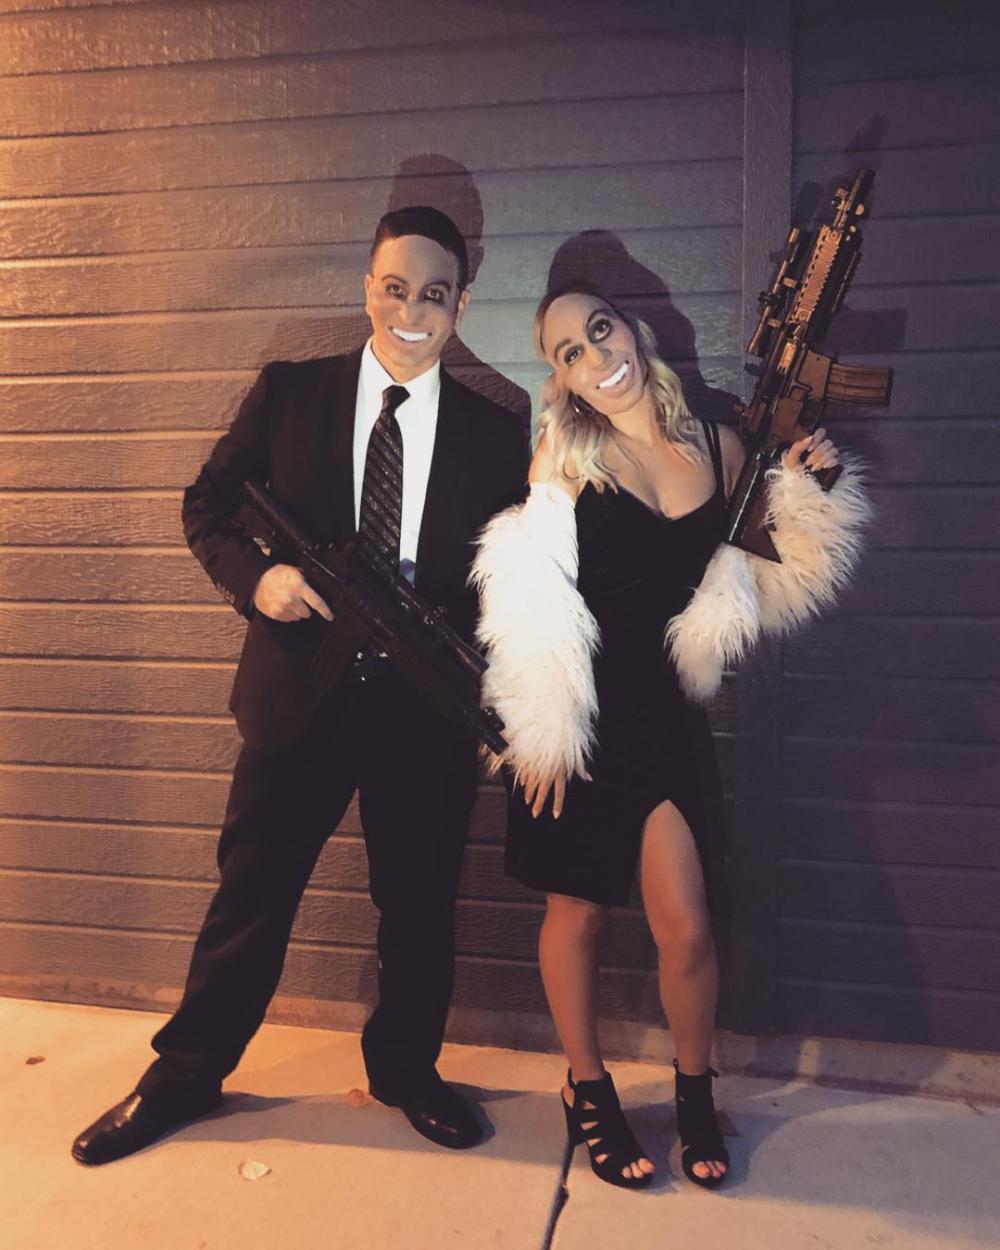 Purge couple costume